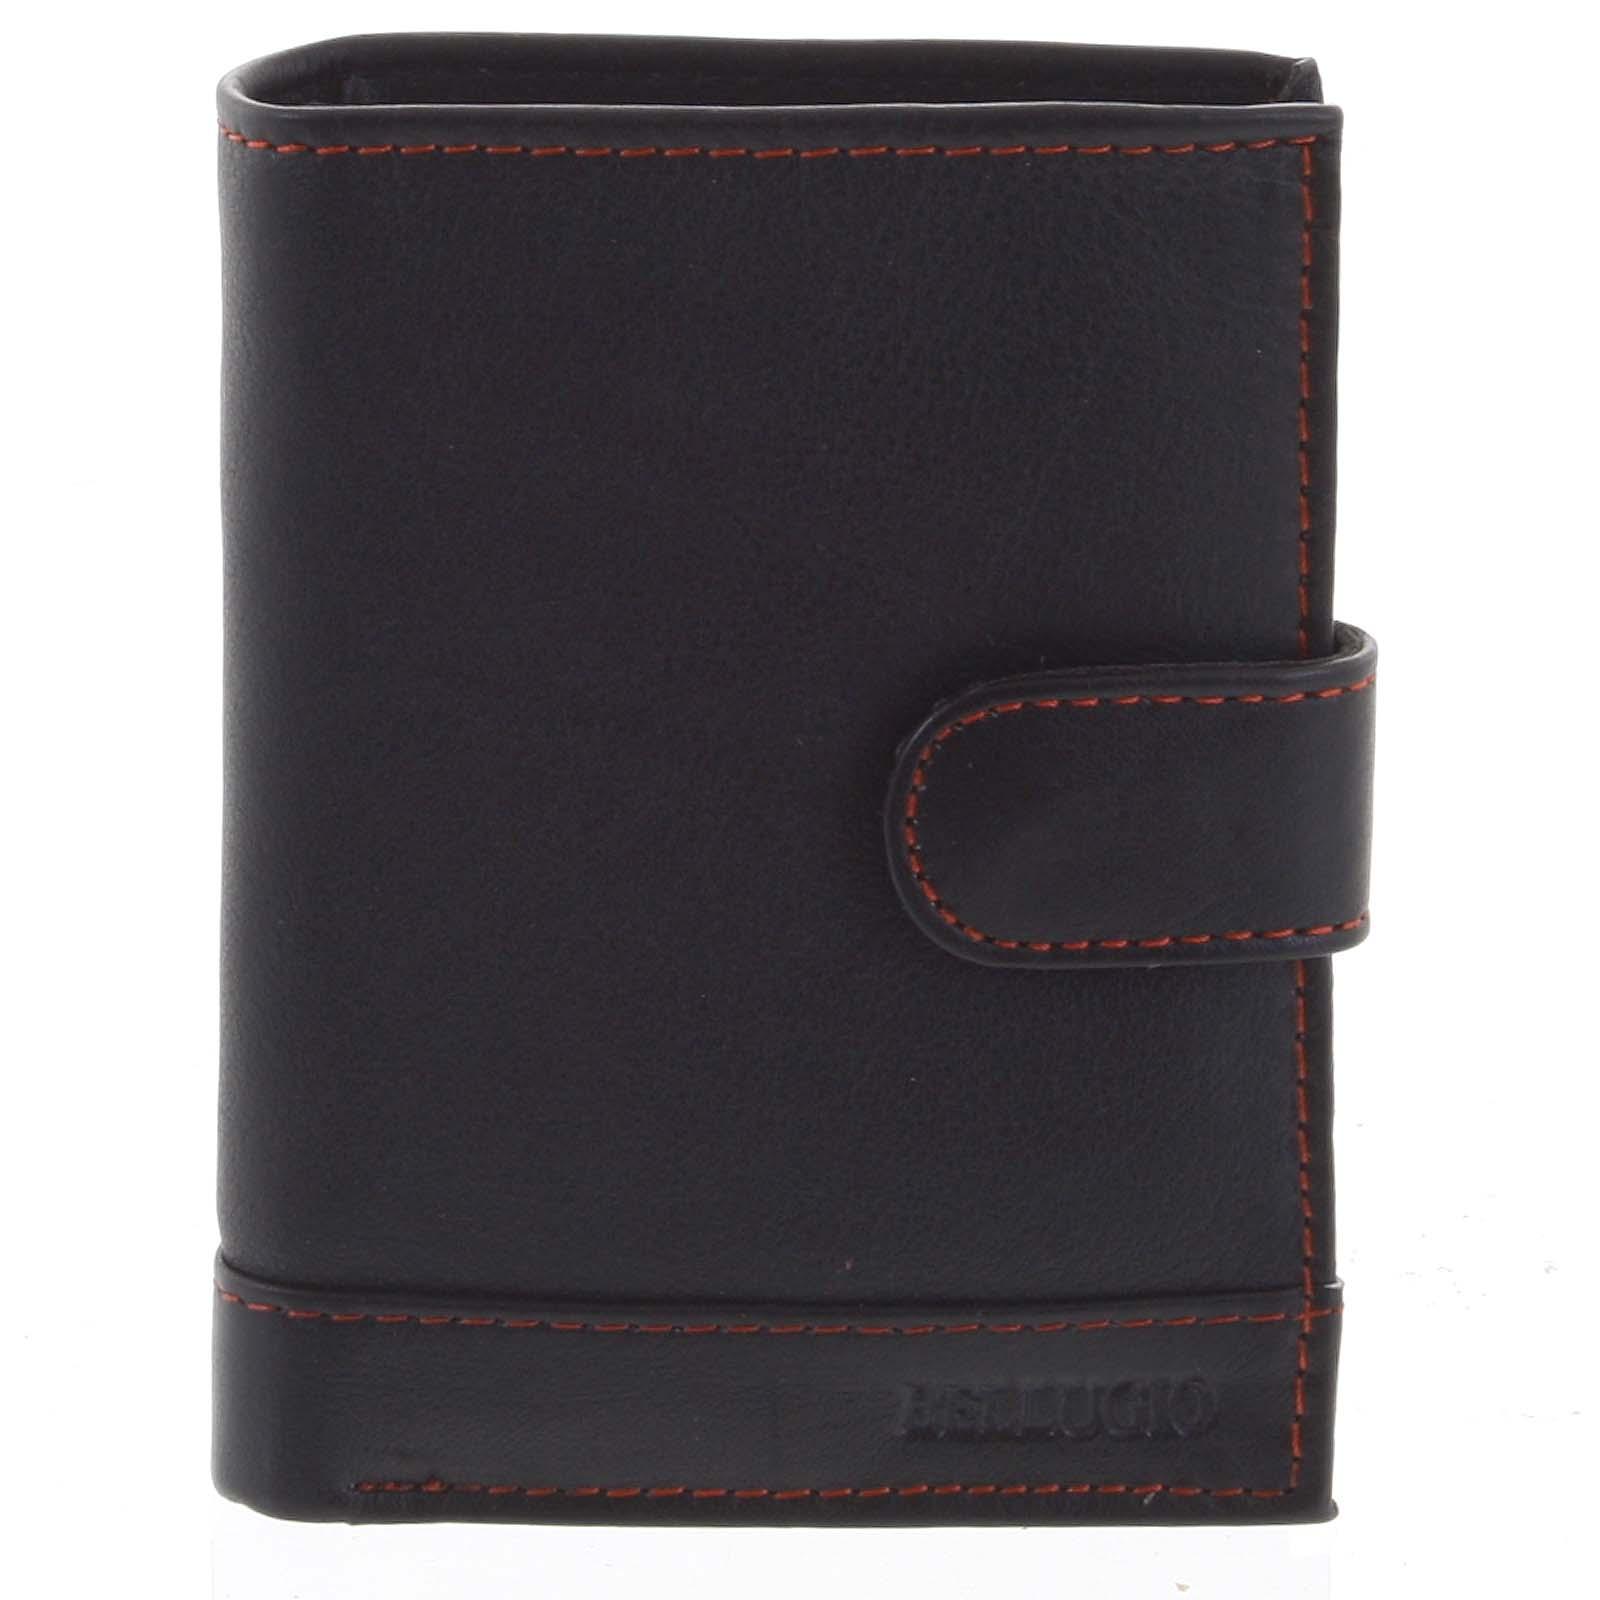 Pánská kožená peněženka černo červená - Bellugio Garner